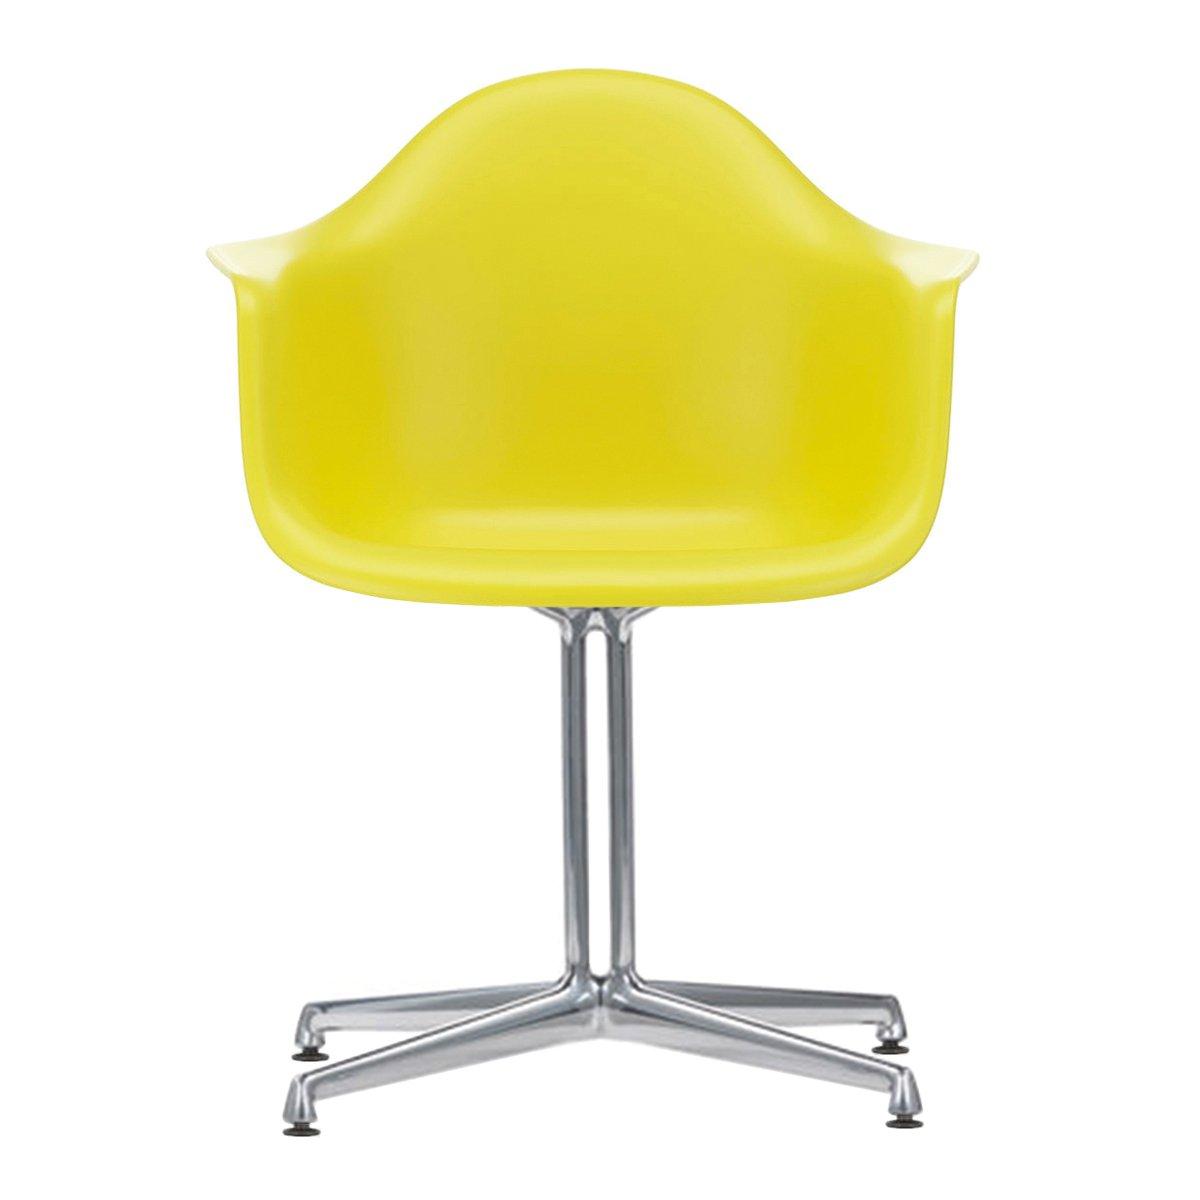 Vitra Eames Plastic Chair DAL Armstoel - Sunlight